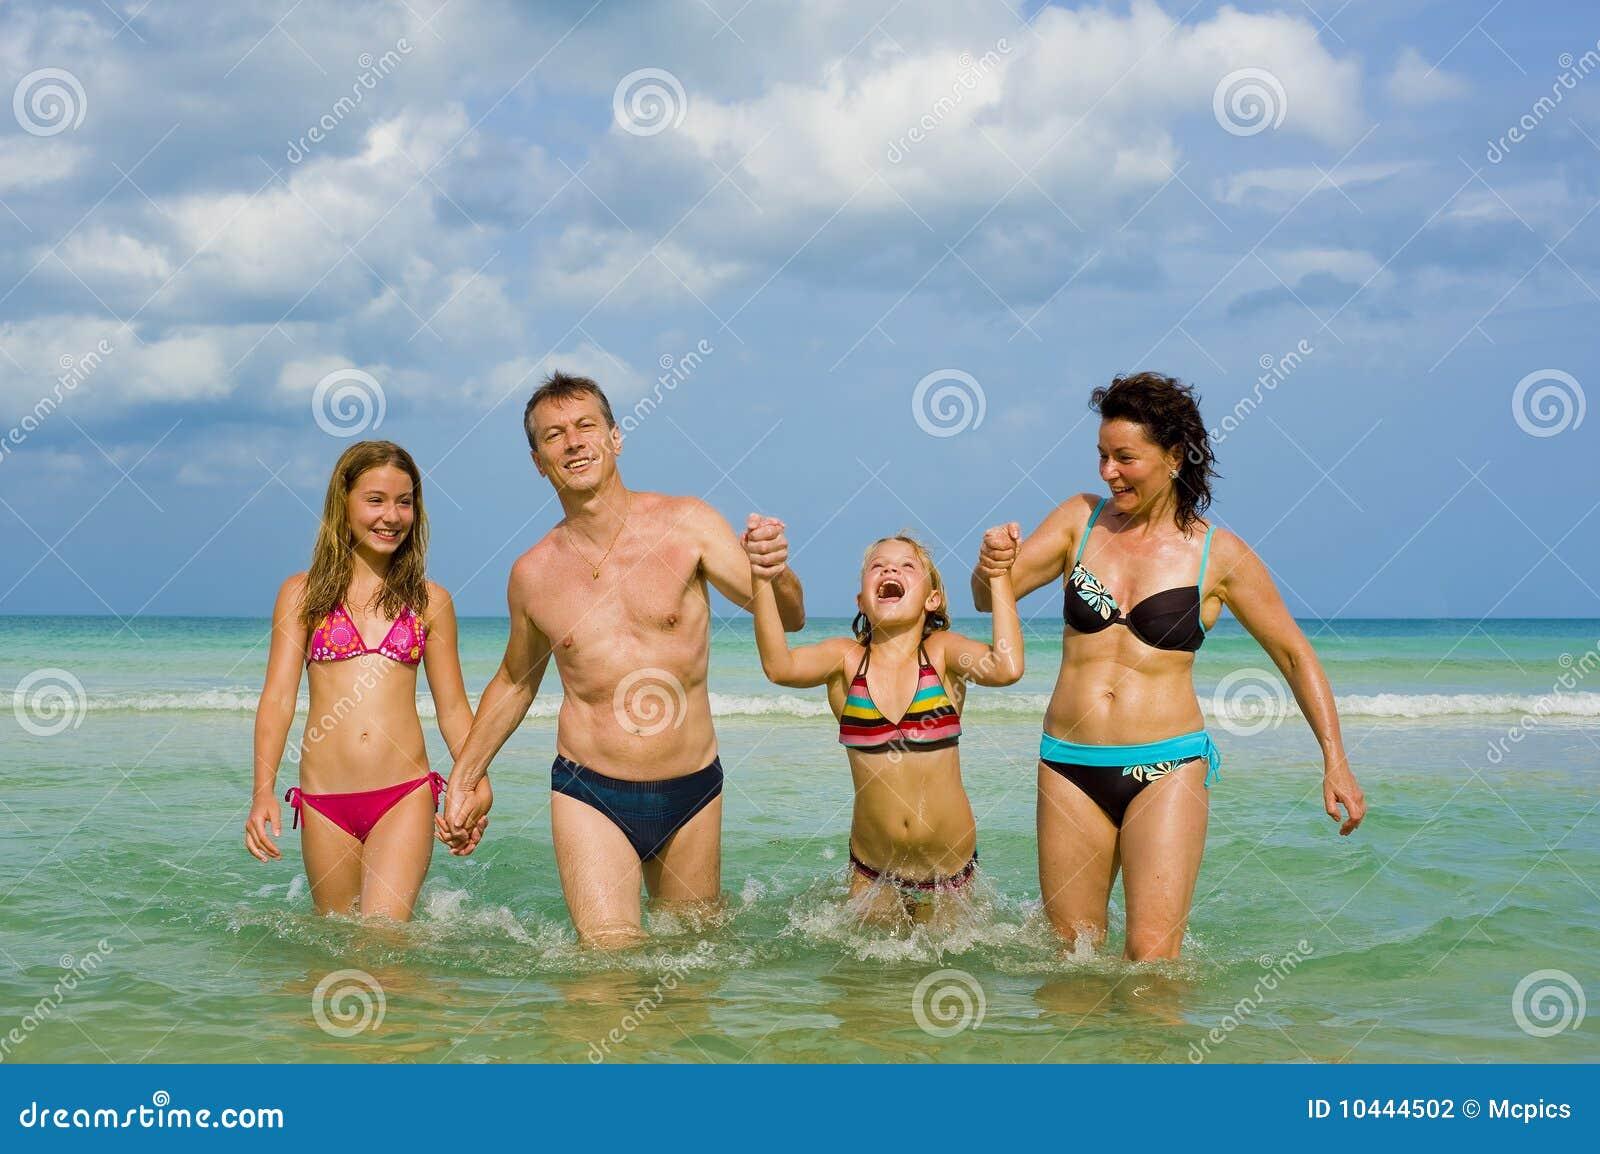 Nudists galleries families